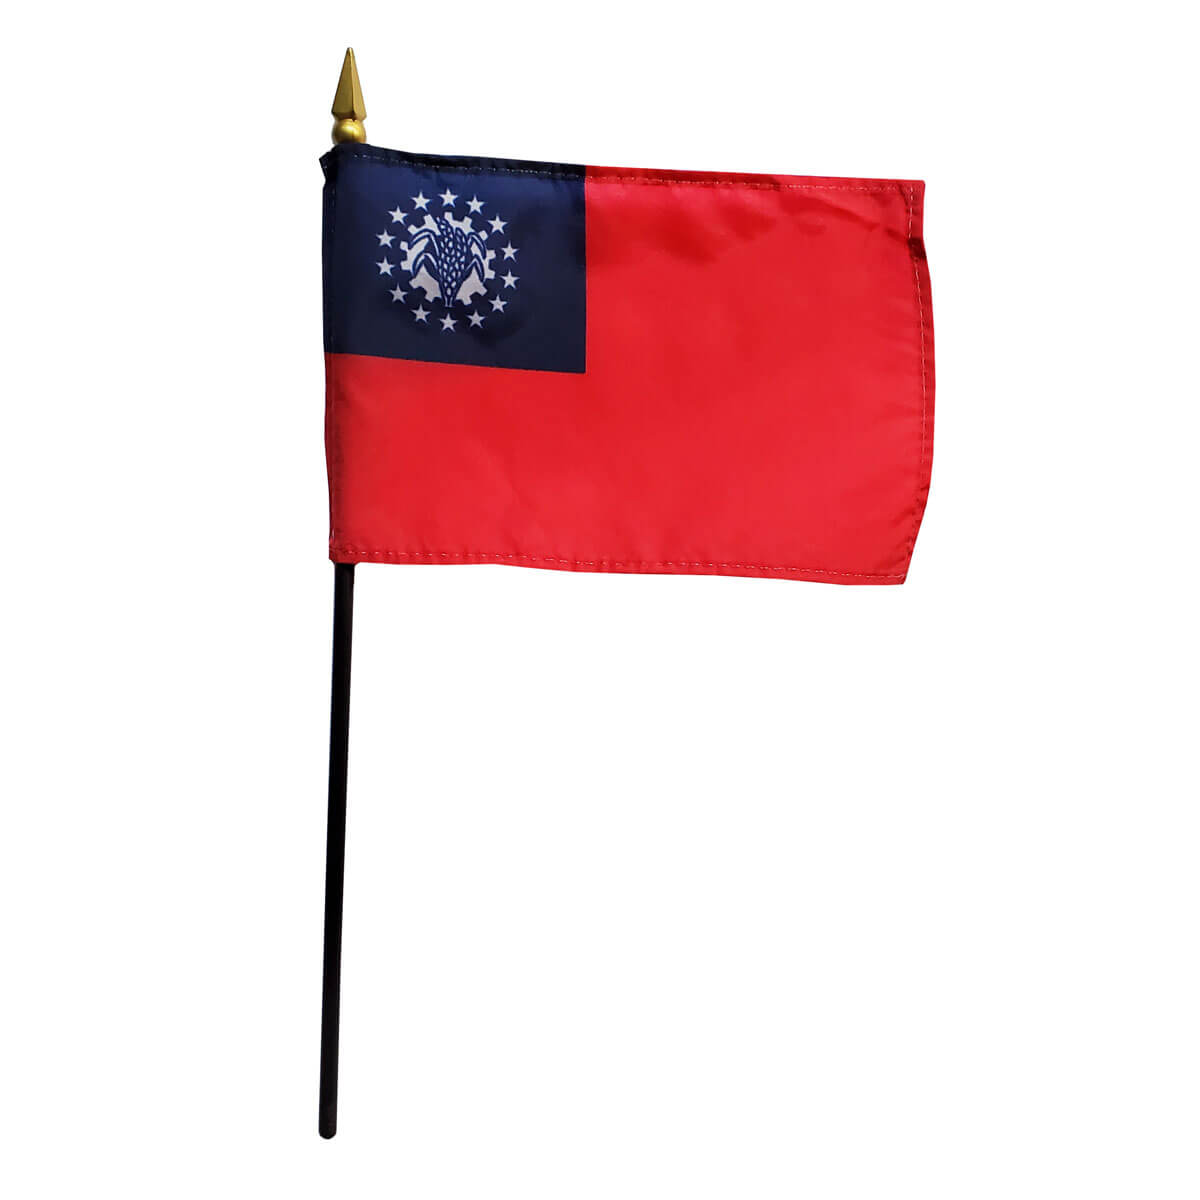 Union of Myanmar (Burma) 1988-2010 Miniature Flag